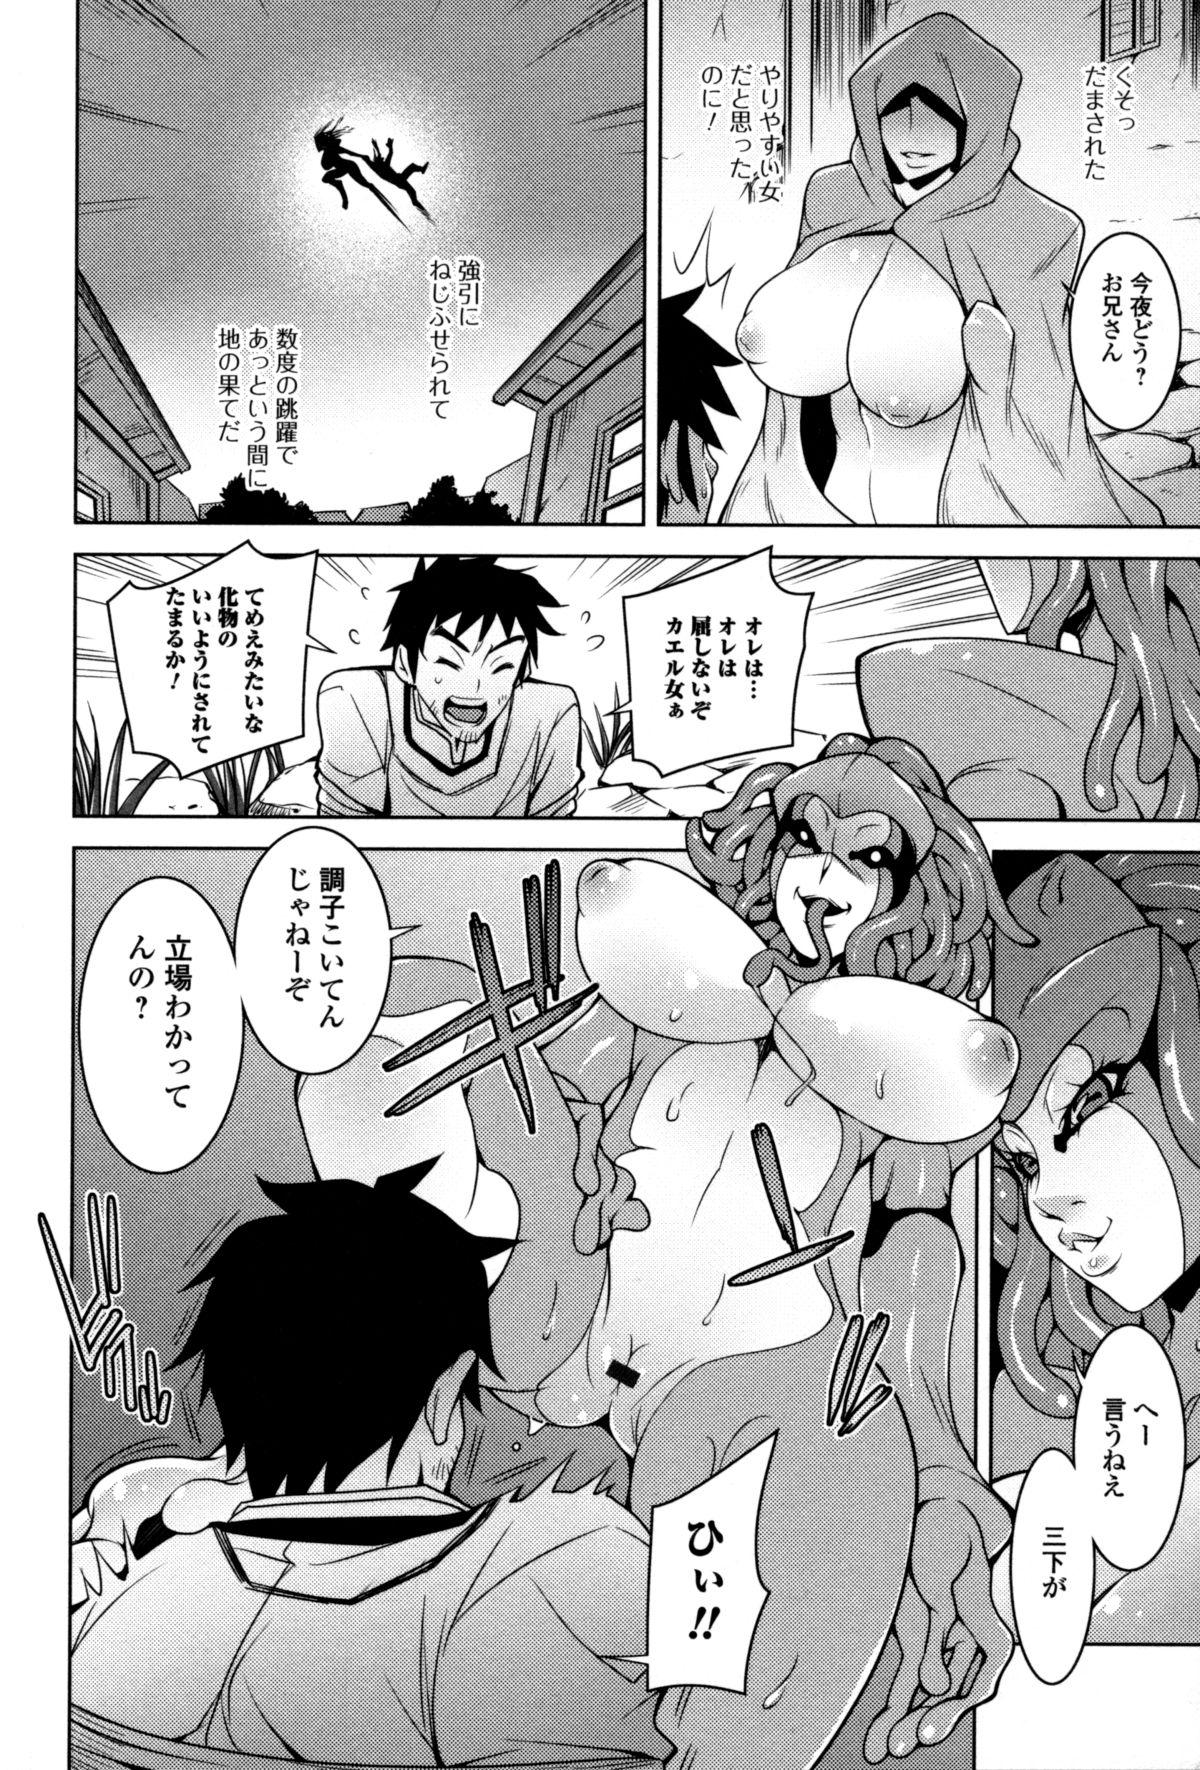 Monster Musume to no Kougou 147